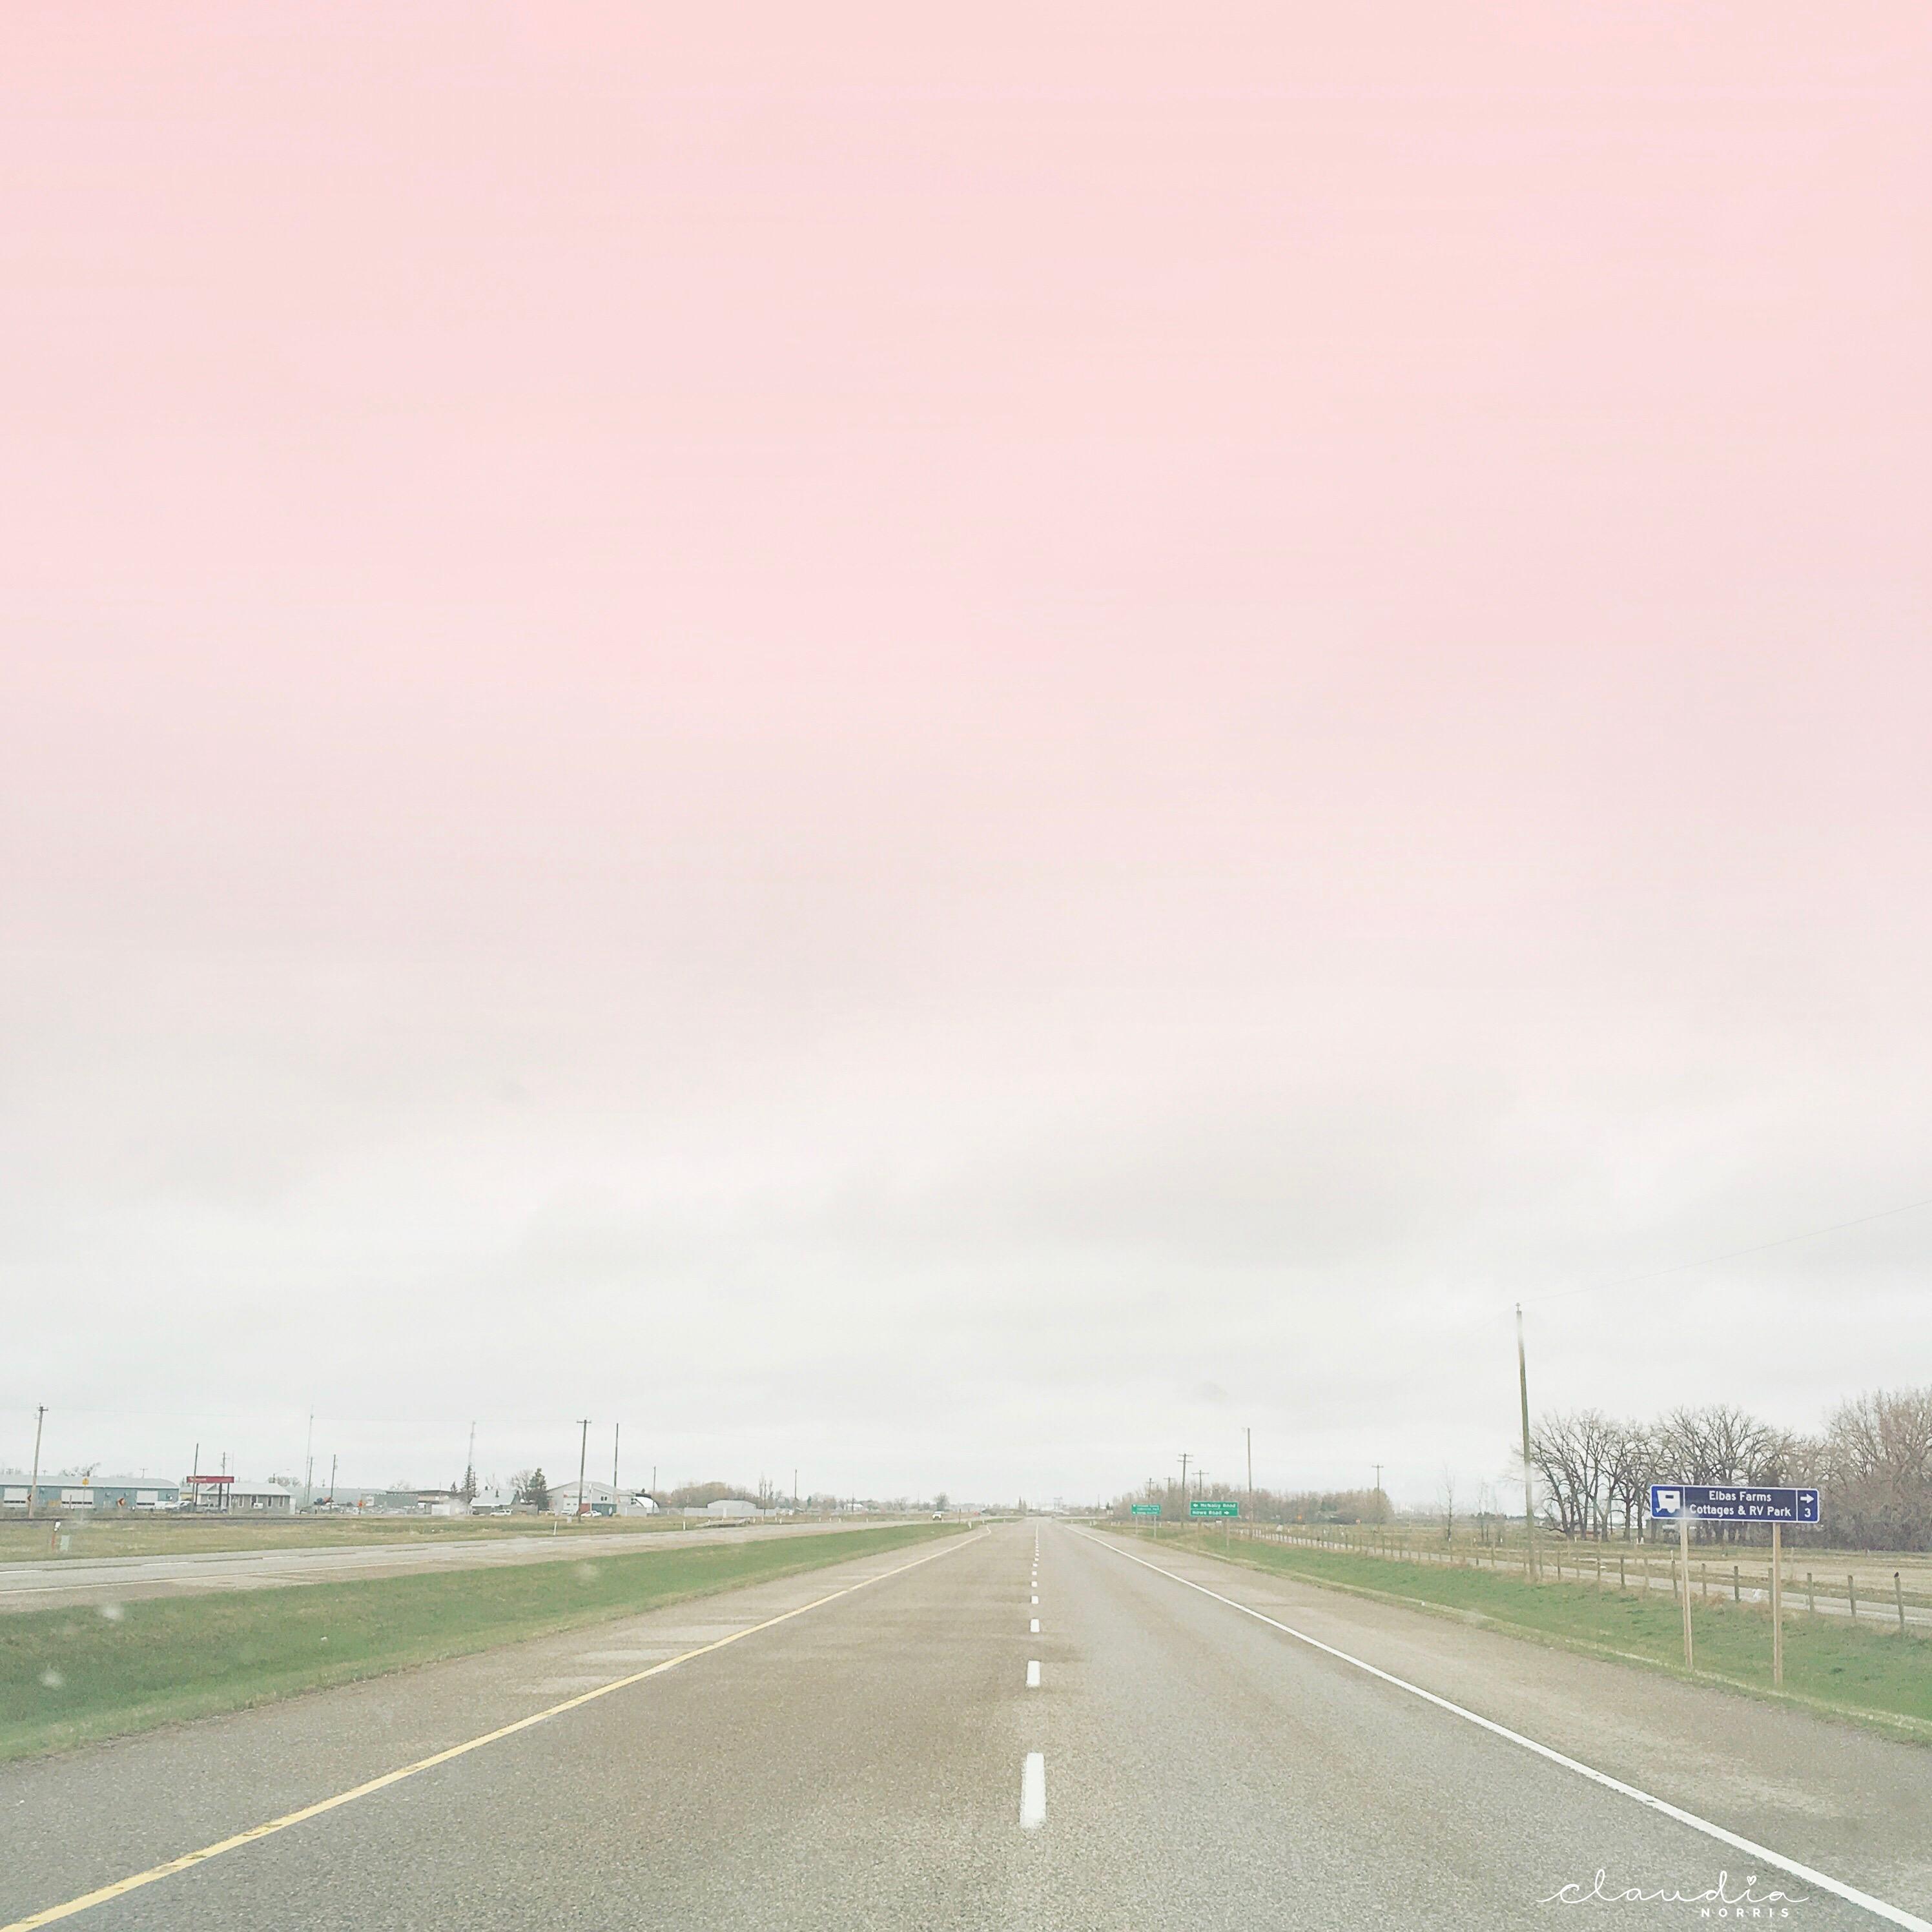 Road Trip 2017 - Claudia Norris